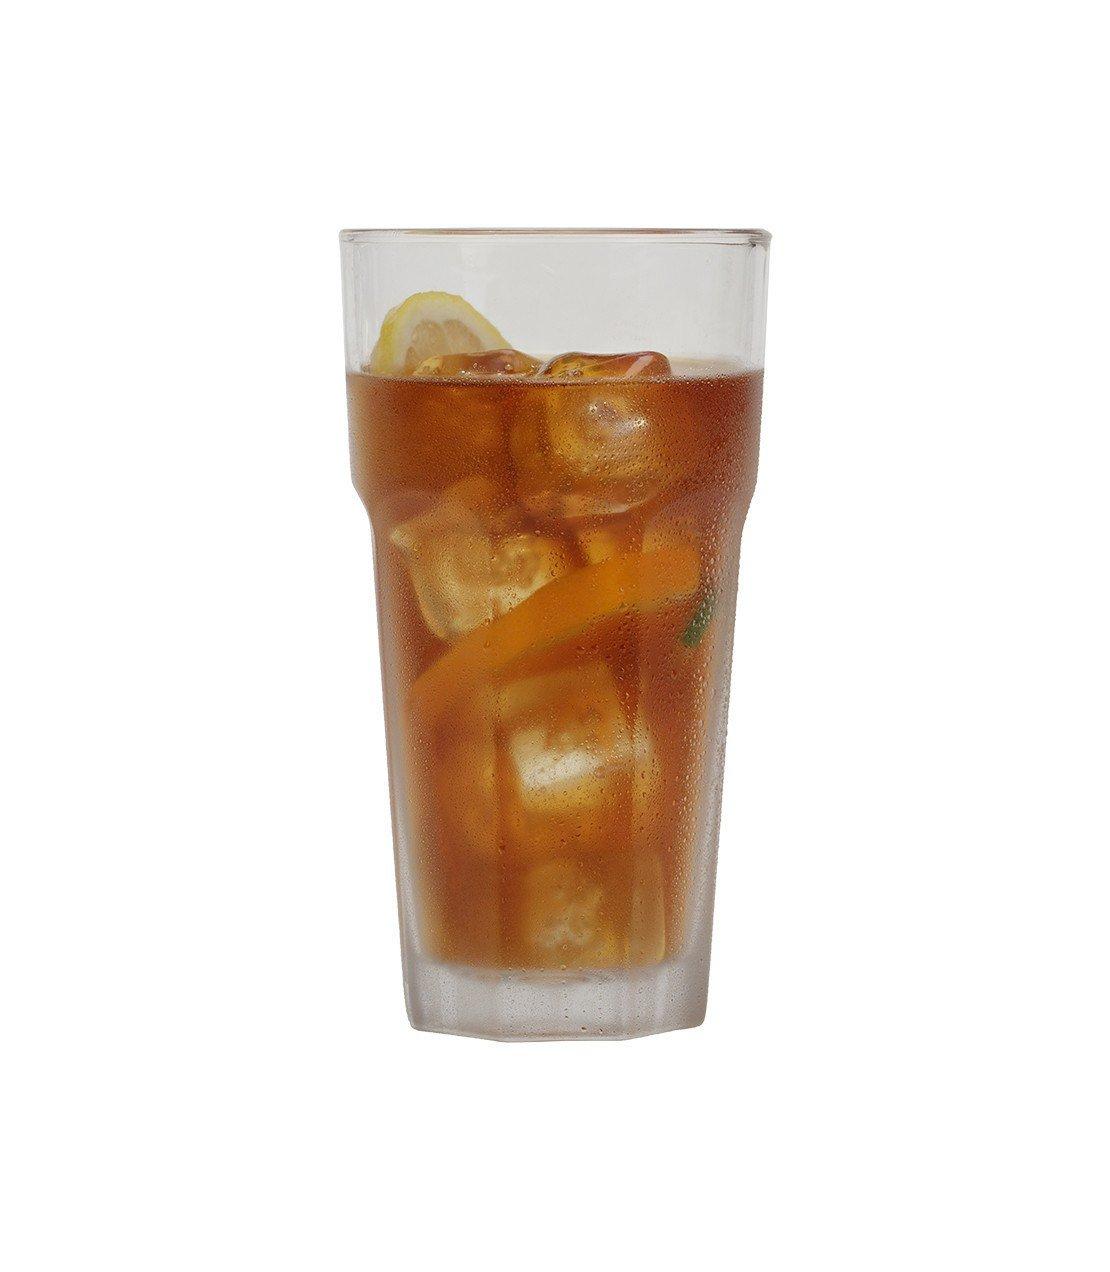 Harney & Sons Pomegranate Oolong Fresh Brew Iced Tea